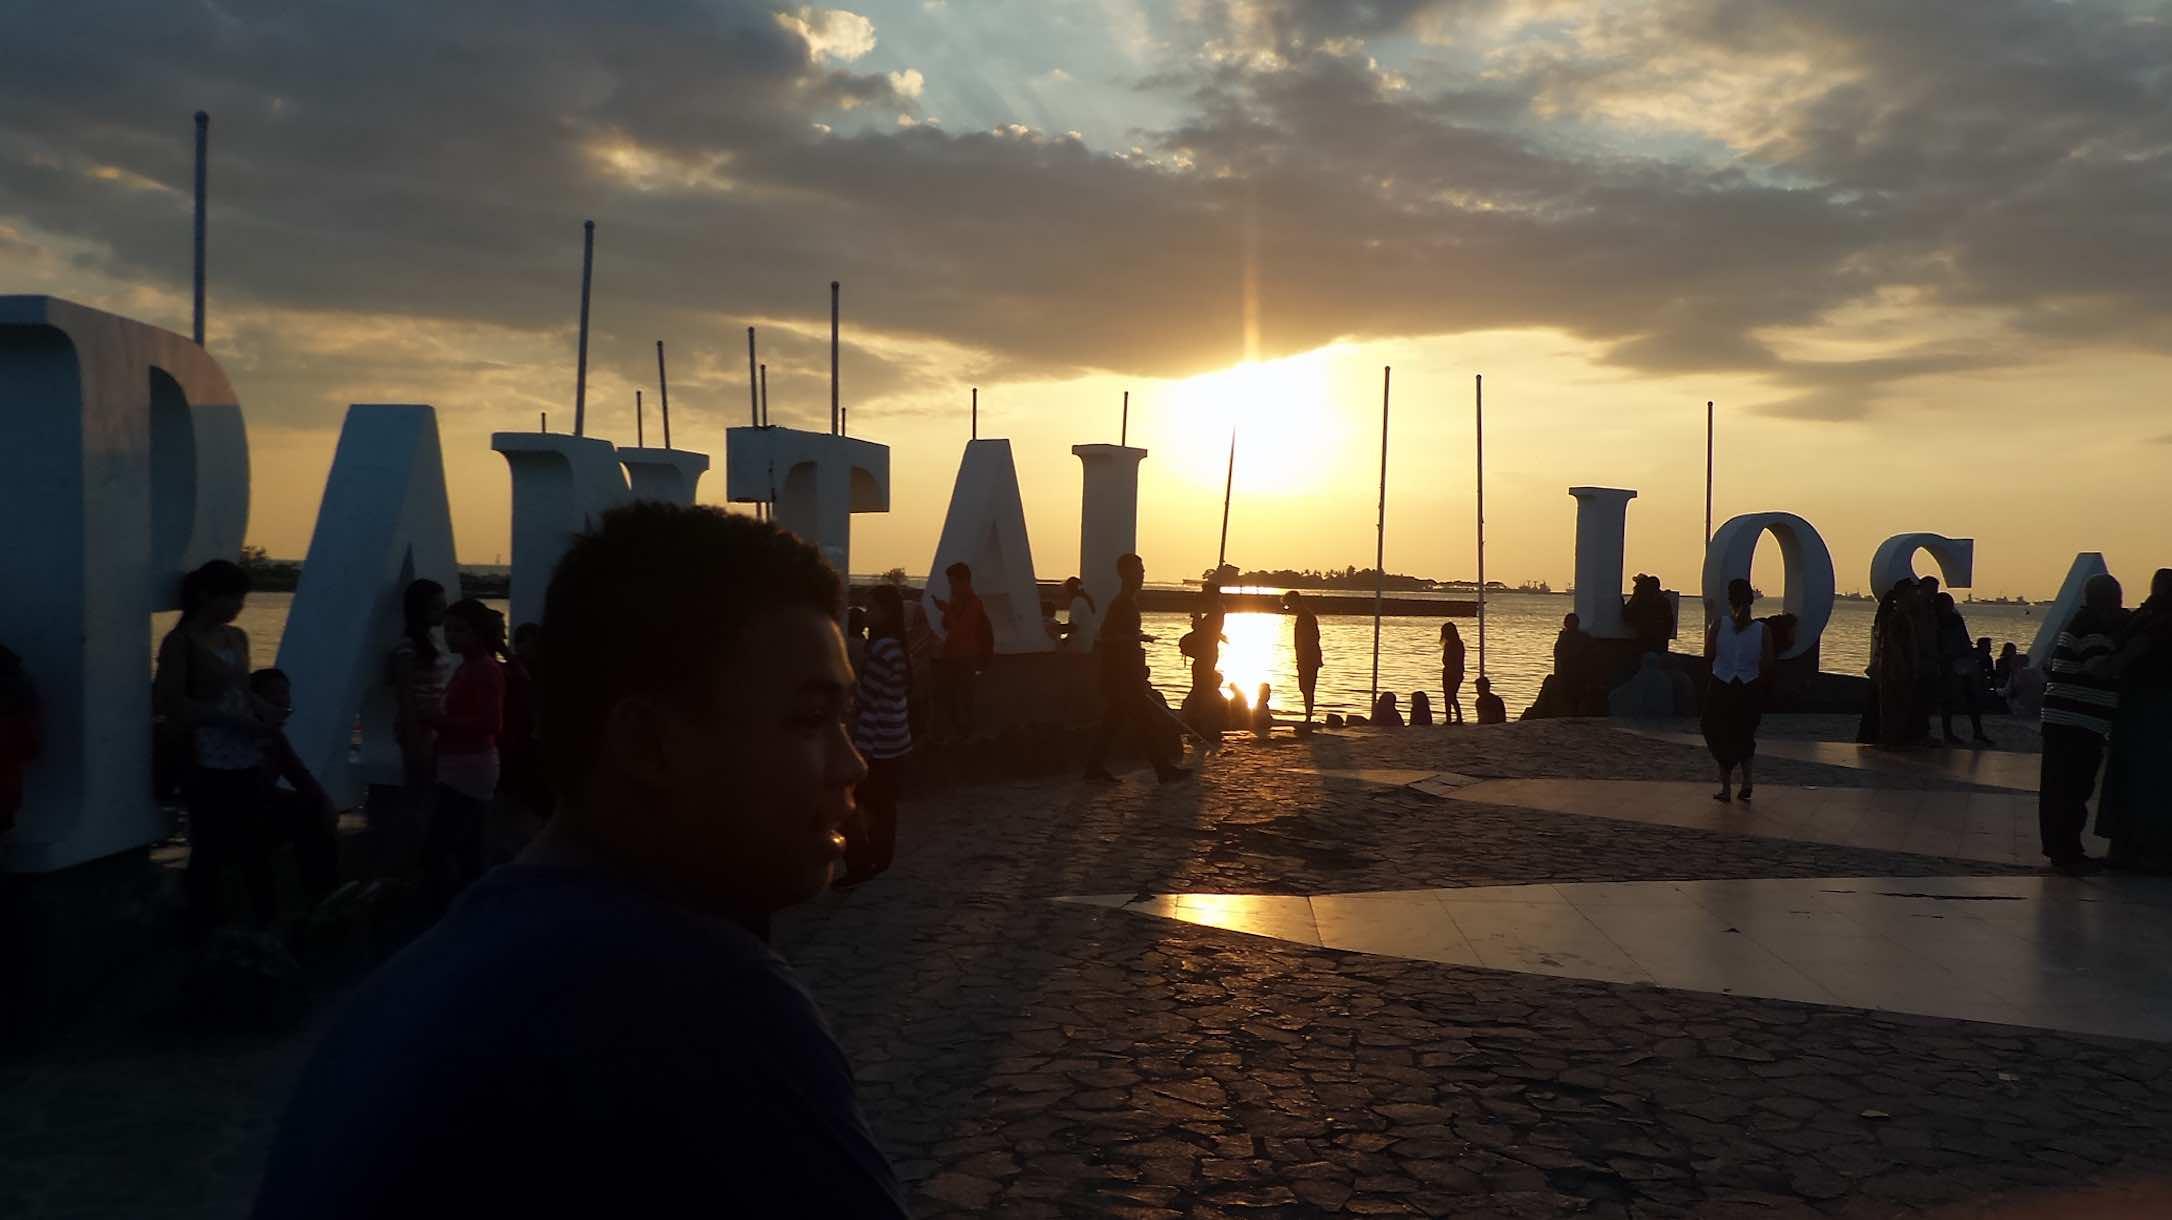 Pantai Losari Indonesia - AspirantSG